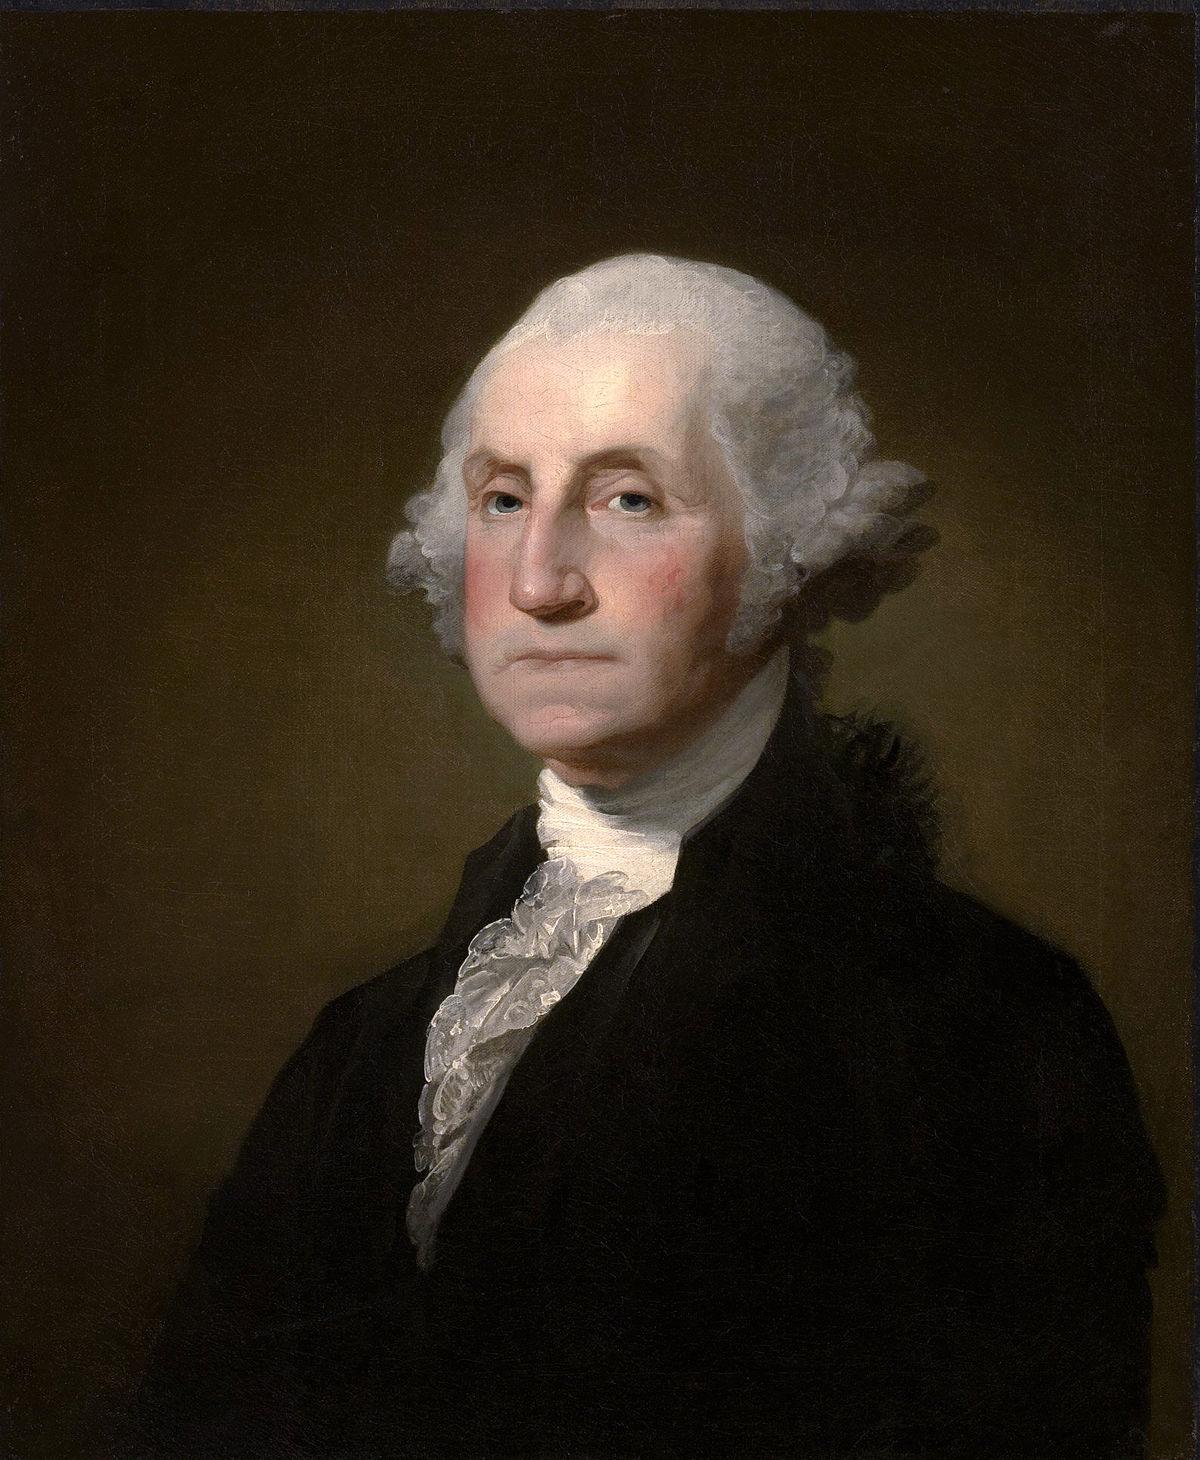 1200px-Gilbert_Stuart_Williamstown_Portrait_of_George_Washington.jpg